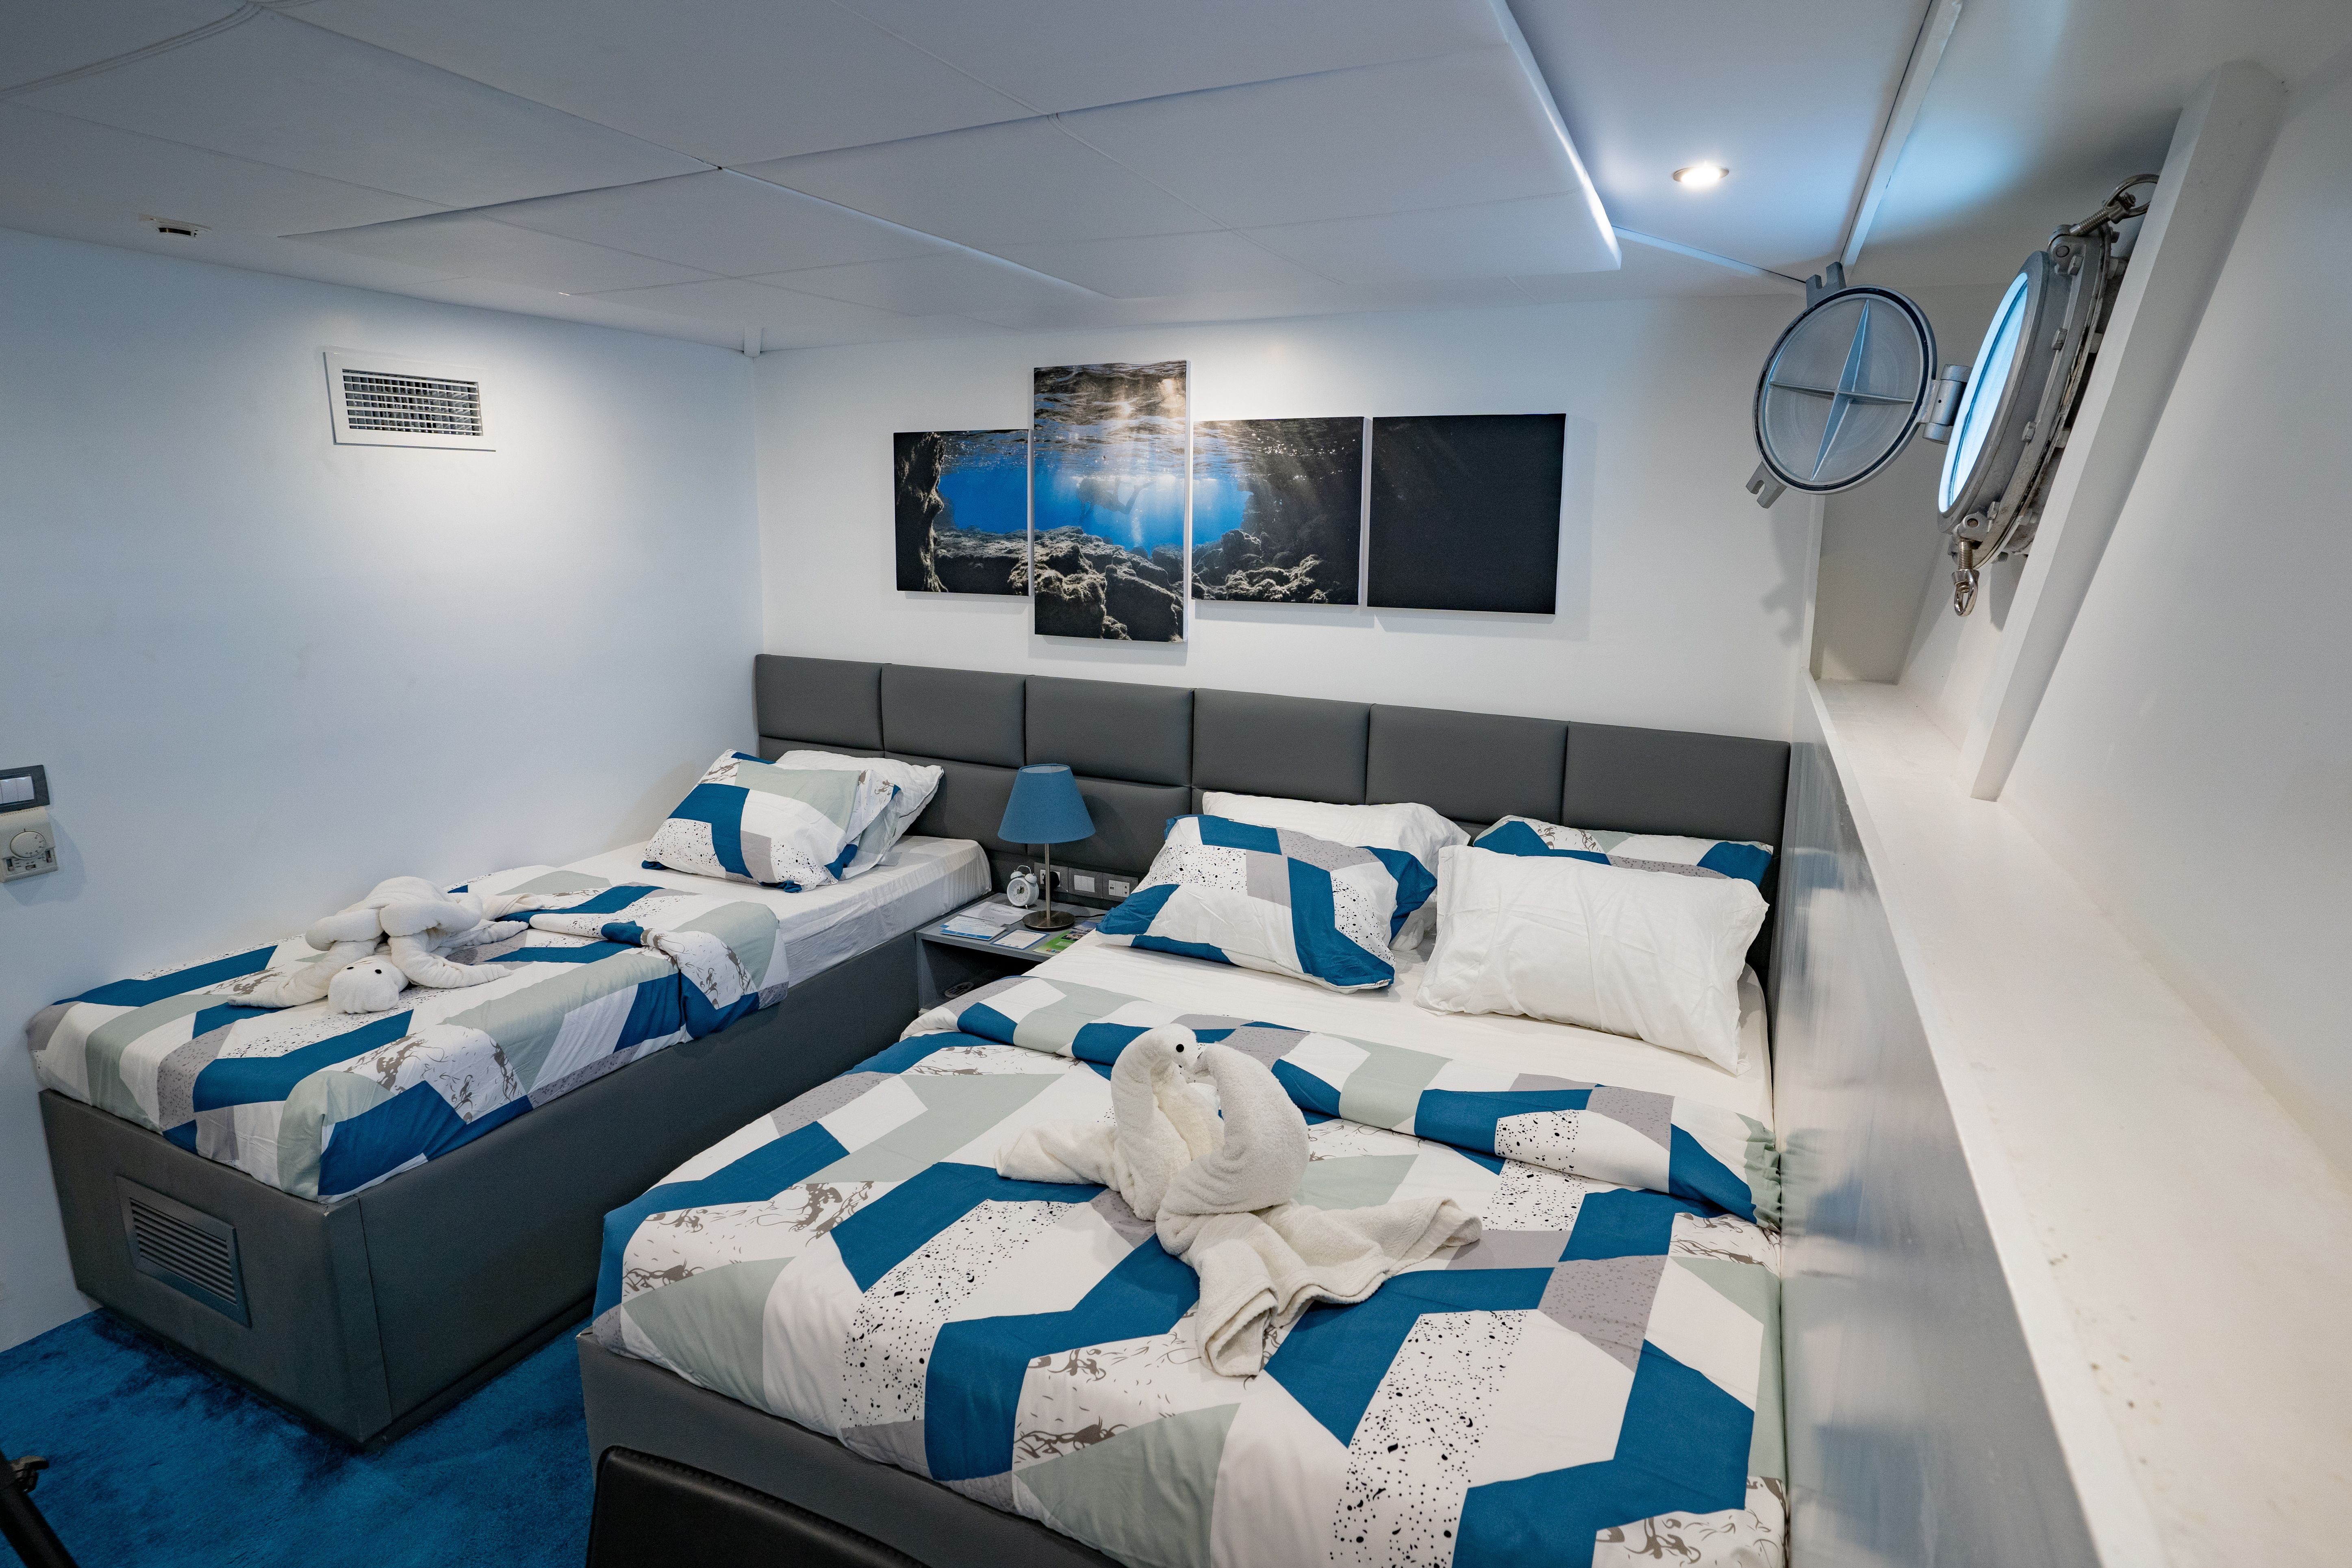 Room - lower deck